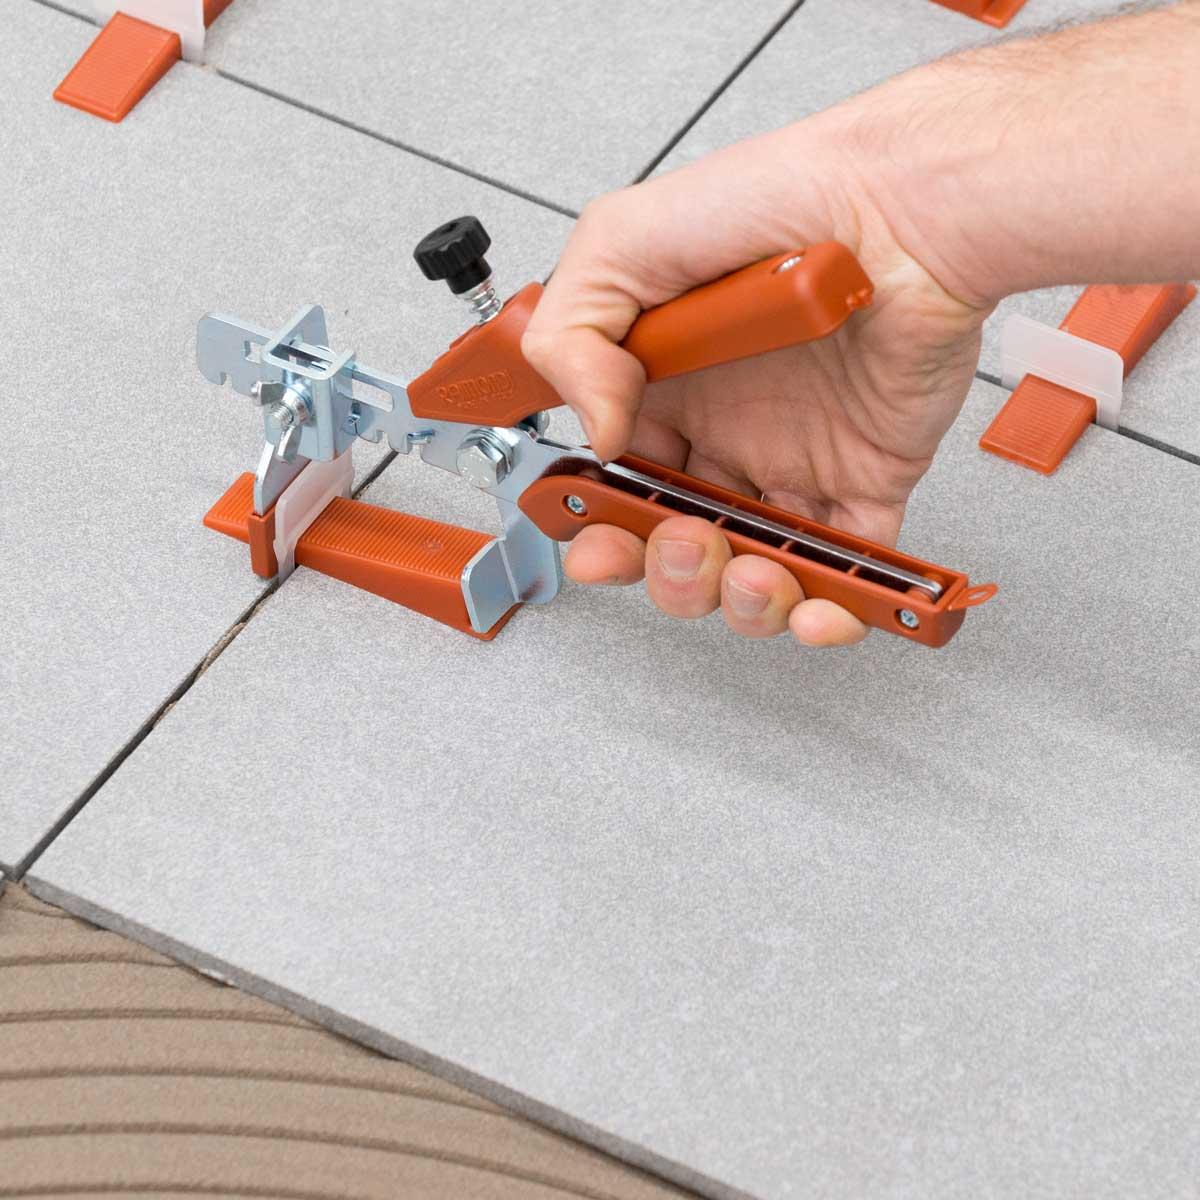 7695 raimondi tile leveling system 1 8 red clip